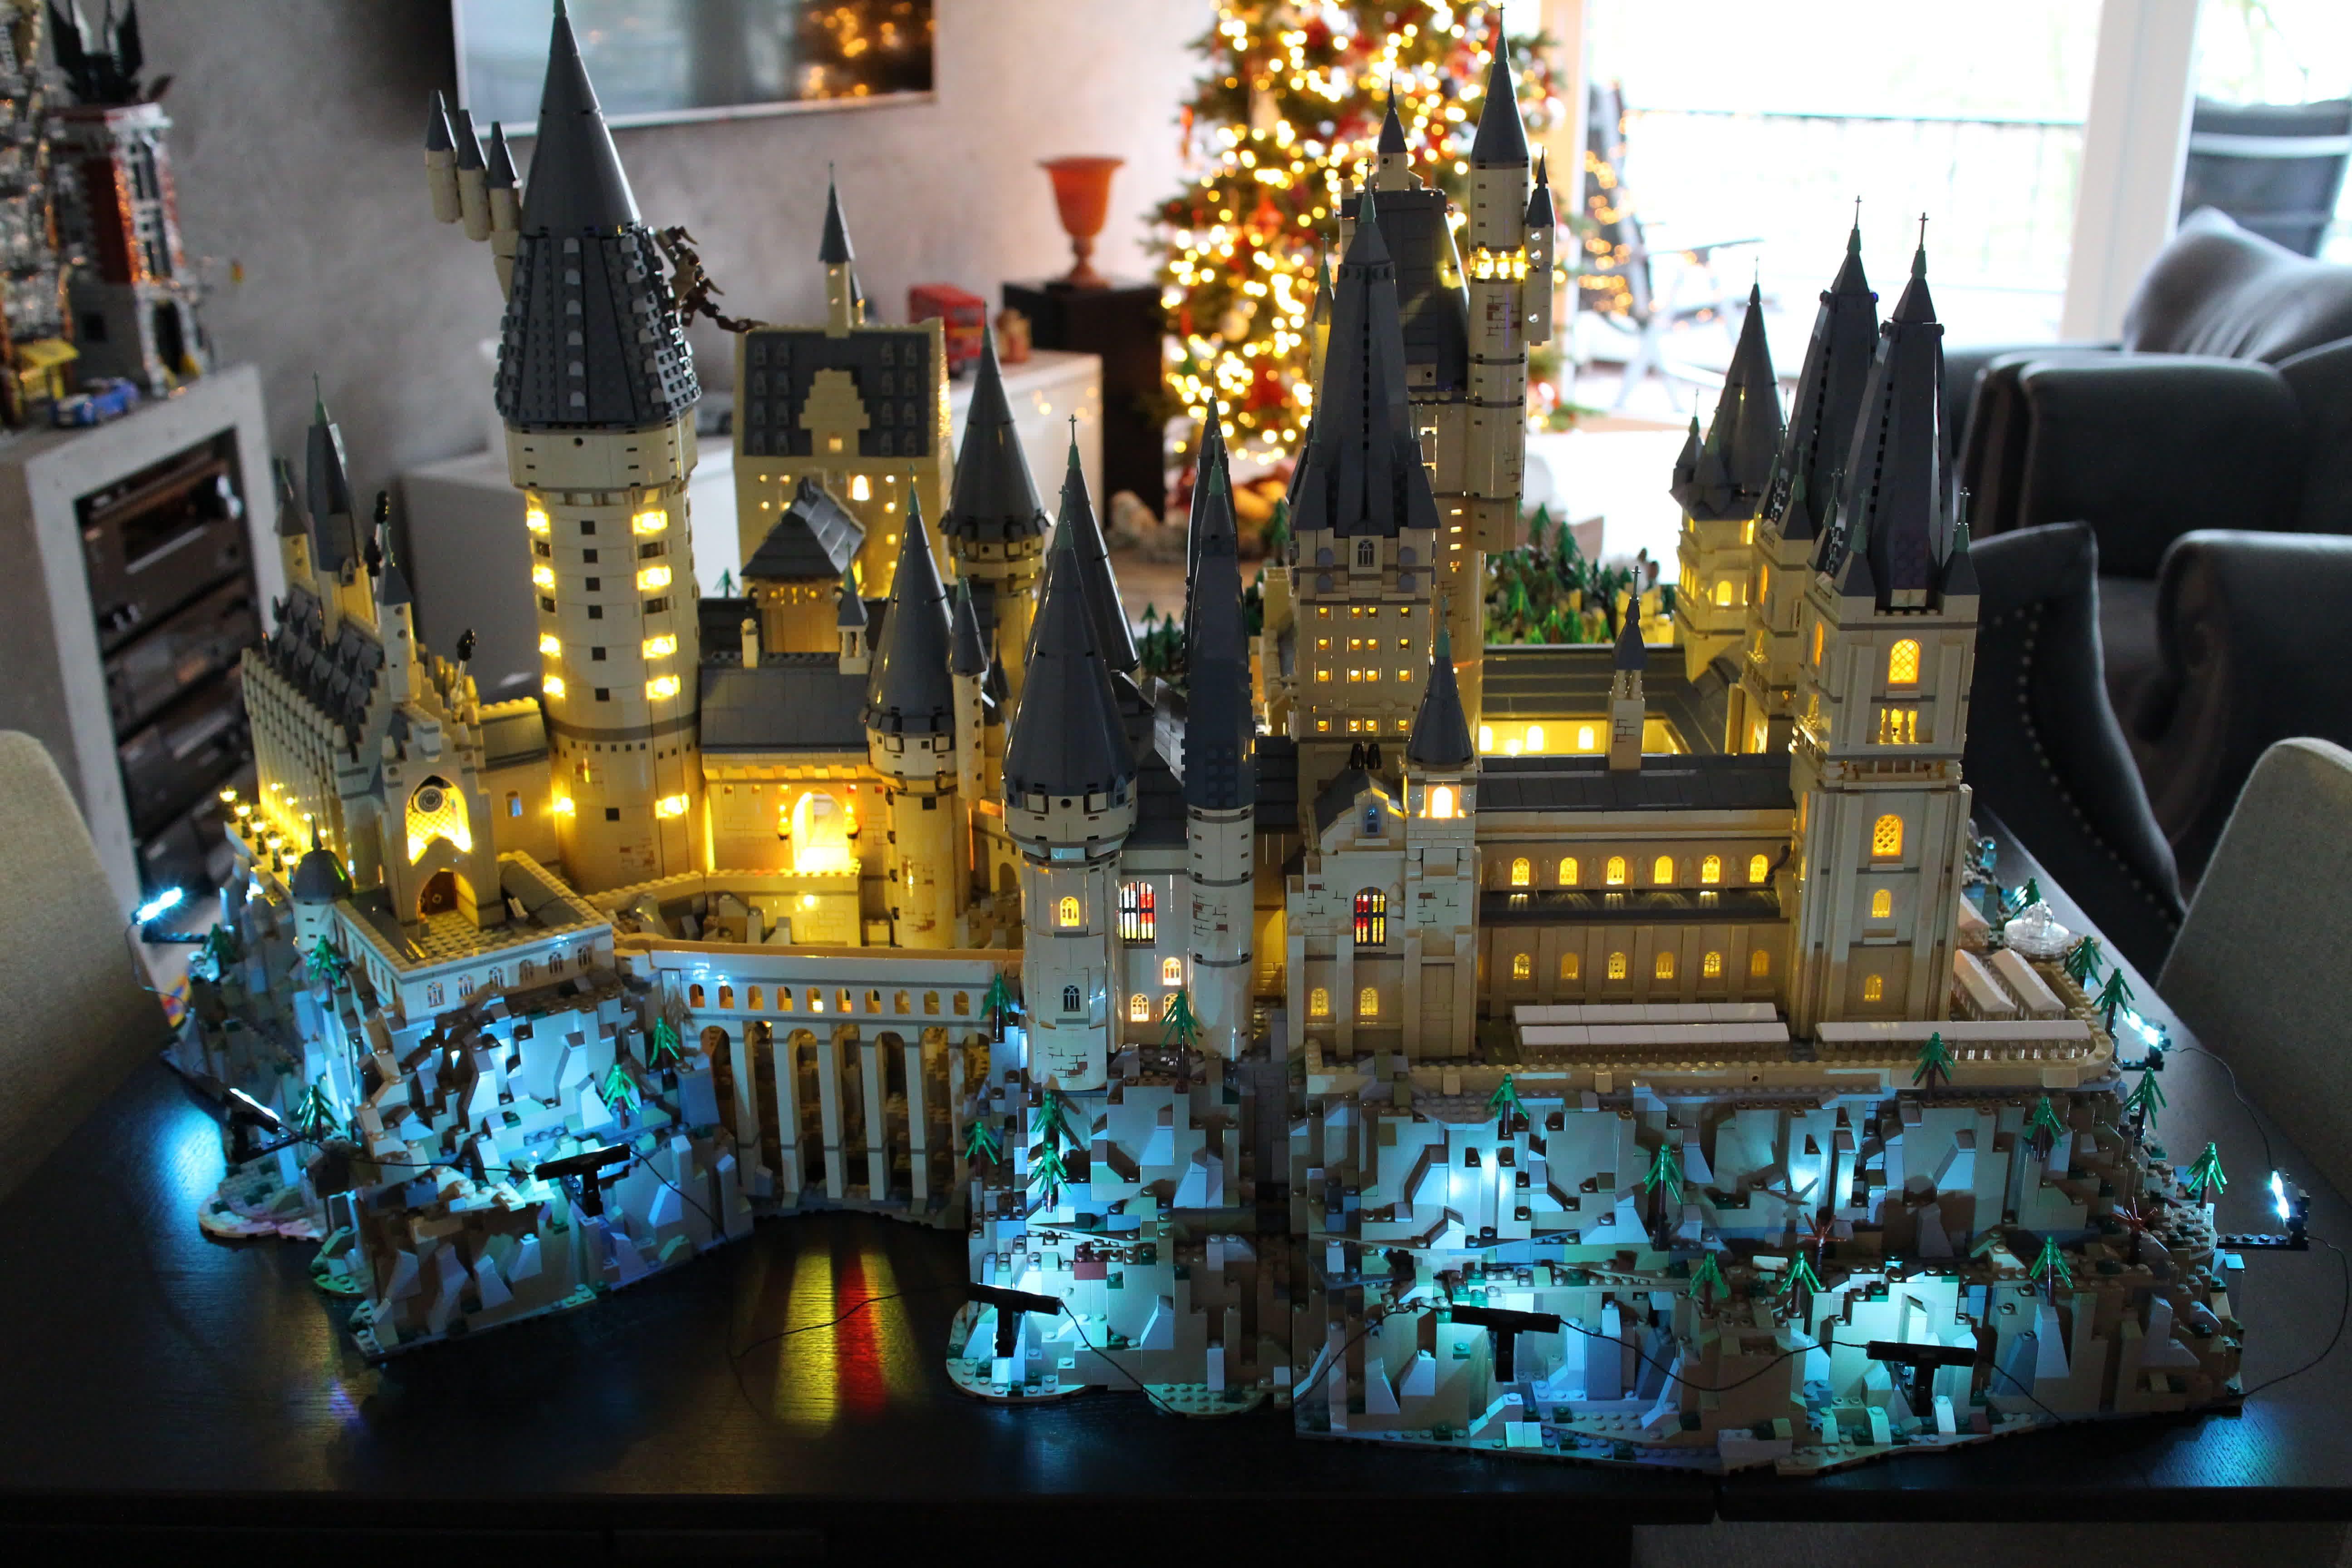 Pin By Roderick Zamora On Wish List In 2020 Lego Hogwarts Hogwarts Hogwarts Castle